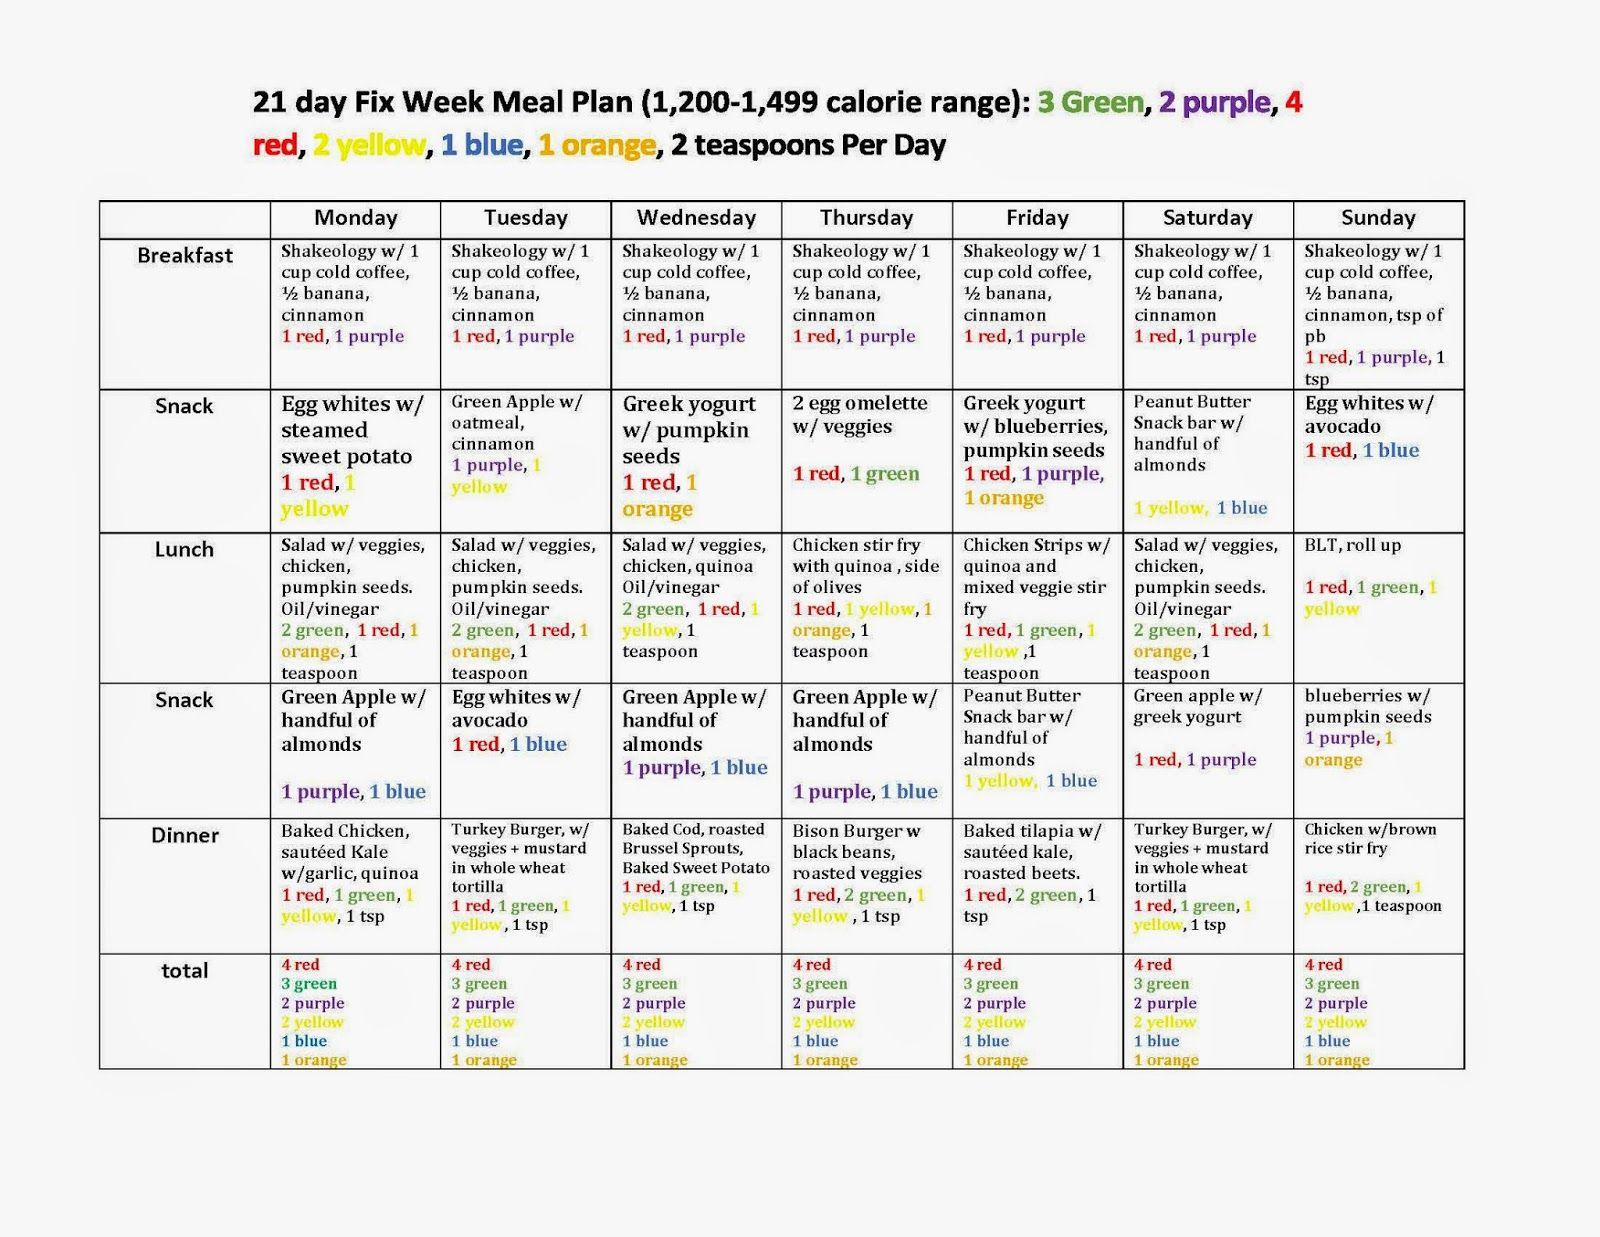 21 Day Fix Keto Meal Plan